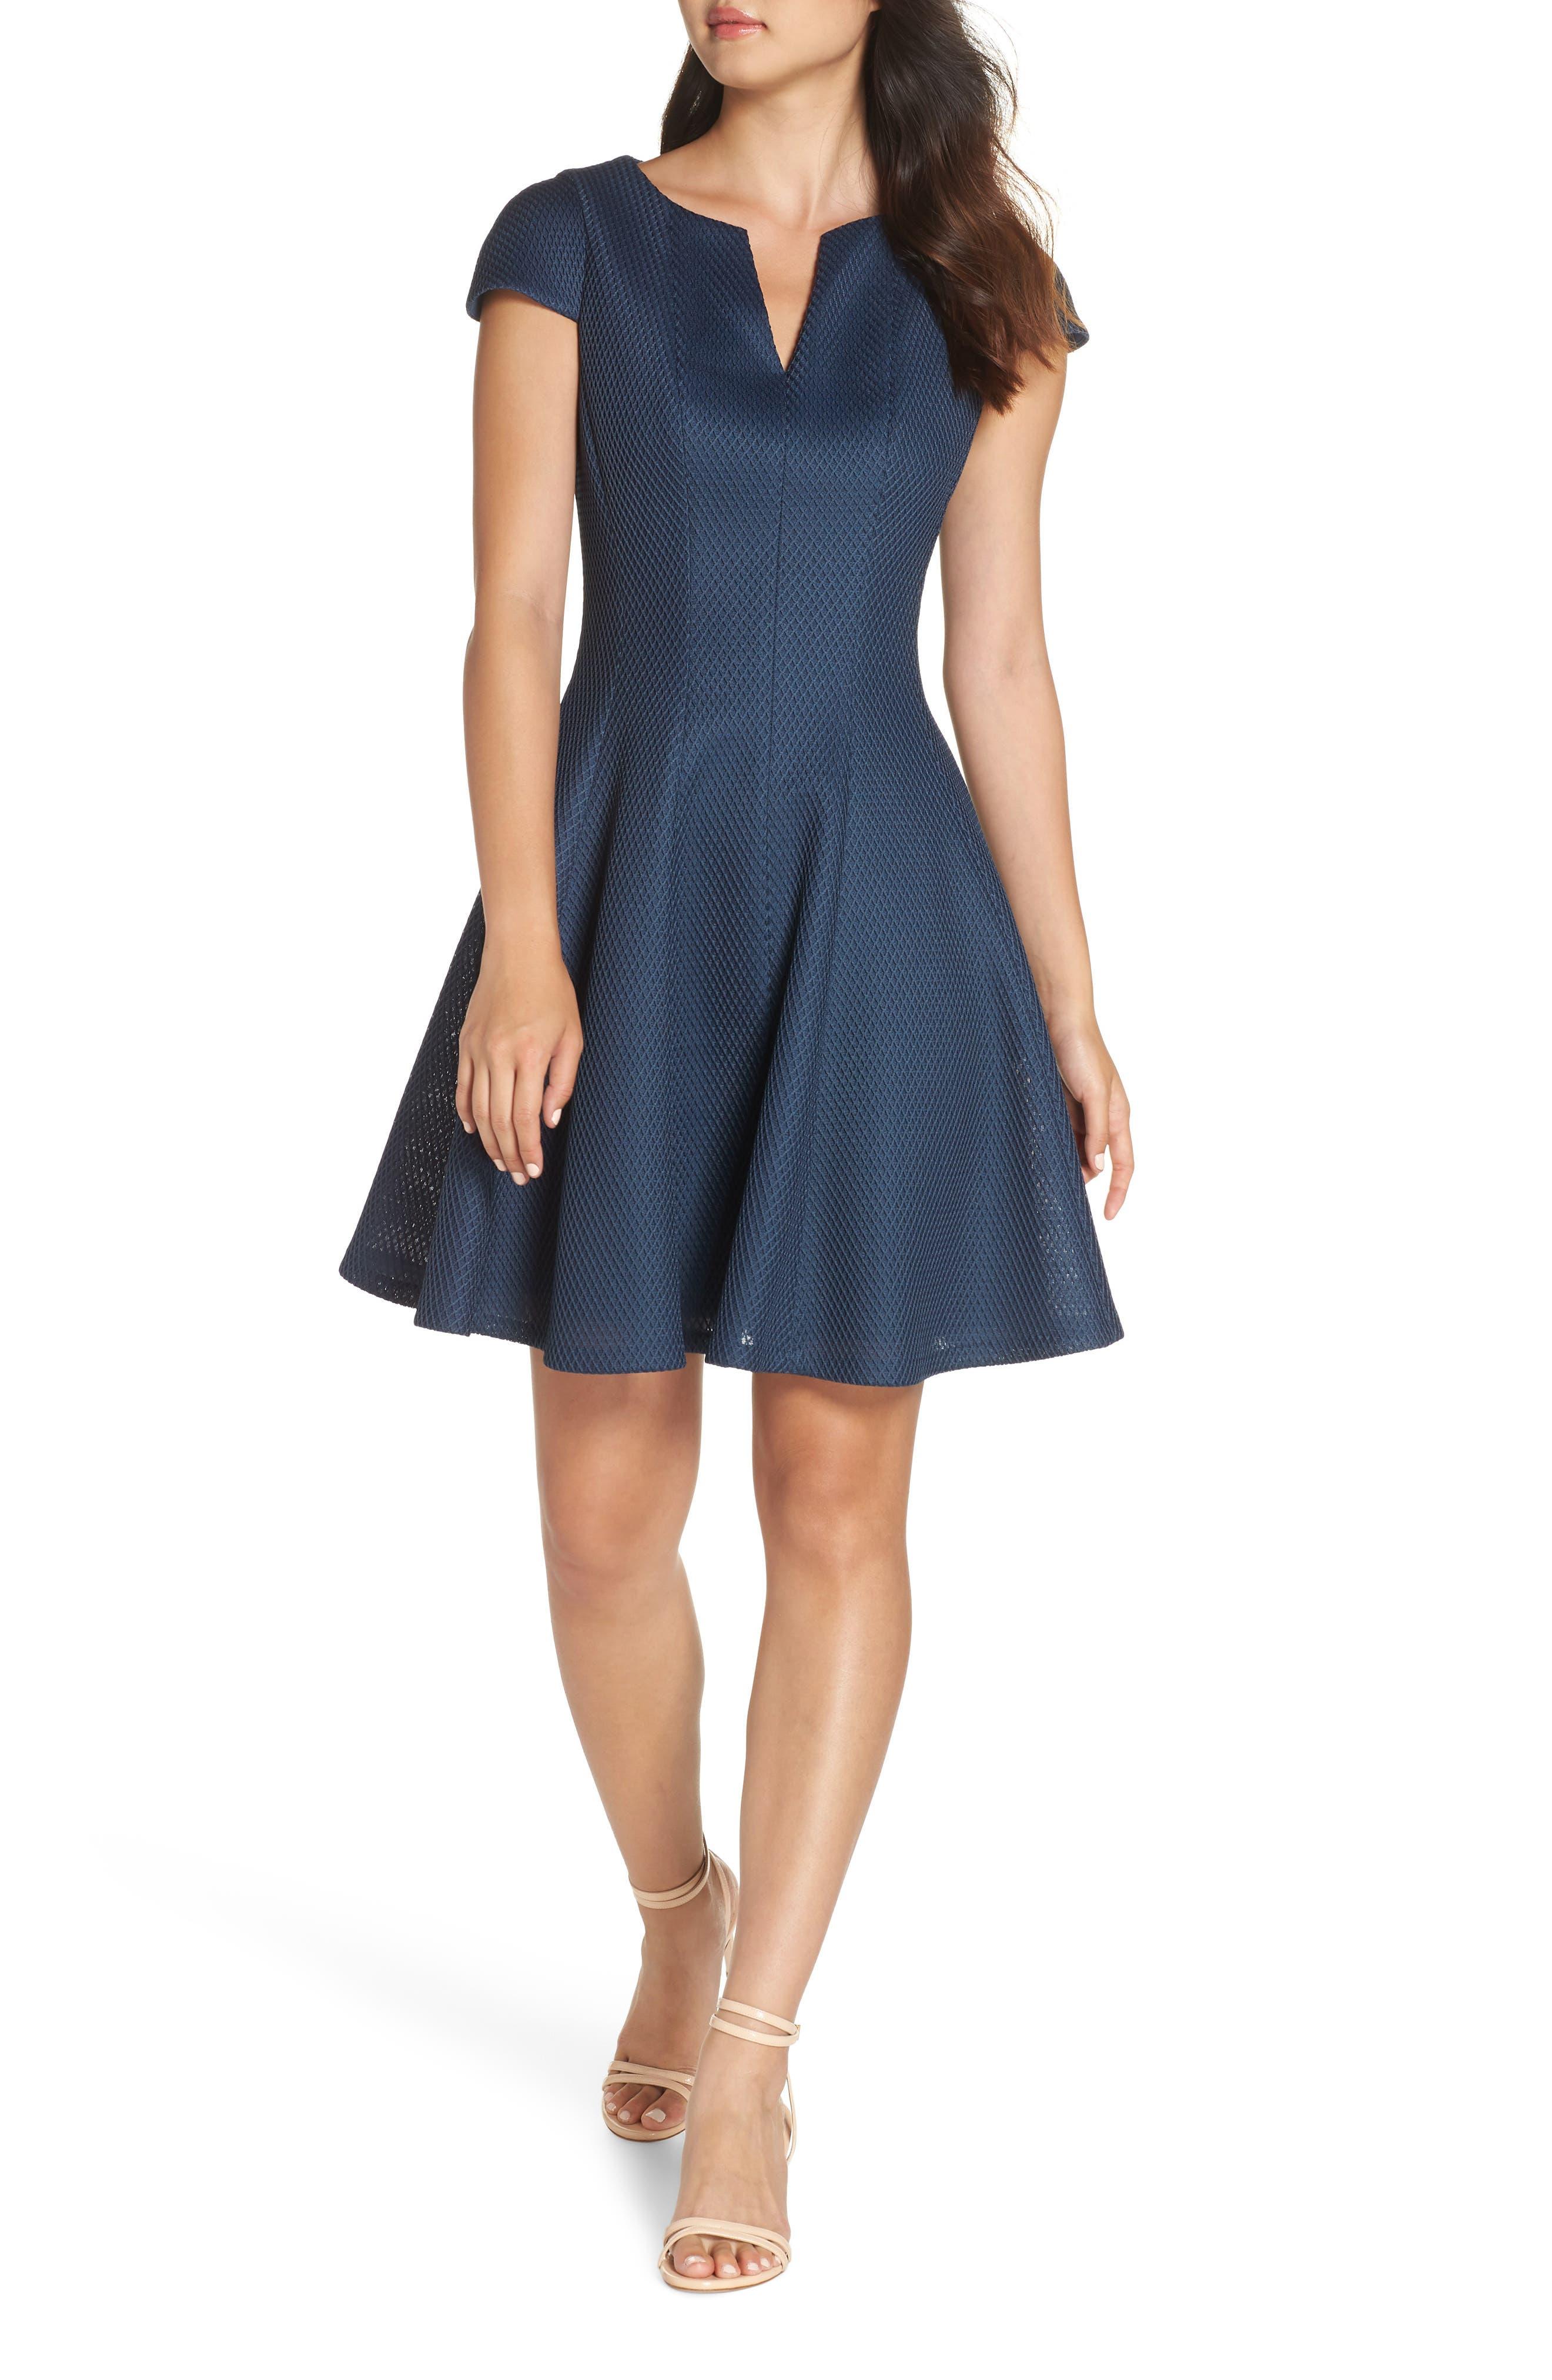 JULIA JORDAN, Fit & Flare Dress, Main thumbnail 1, color, 445